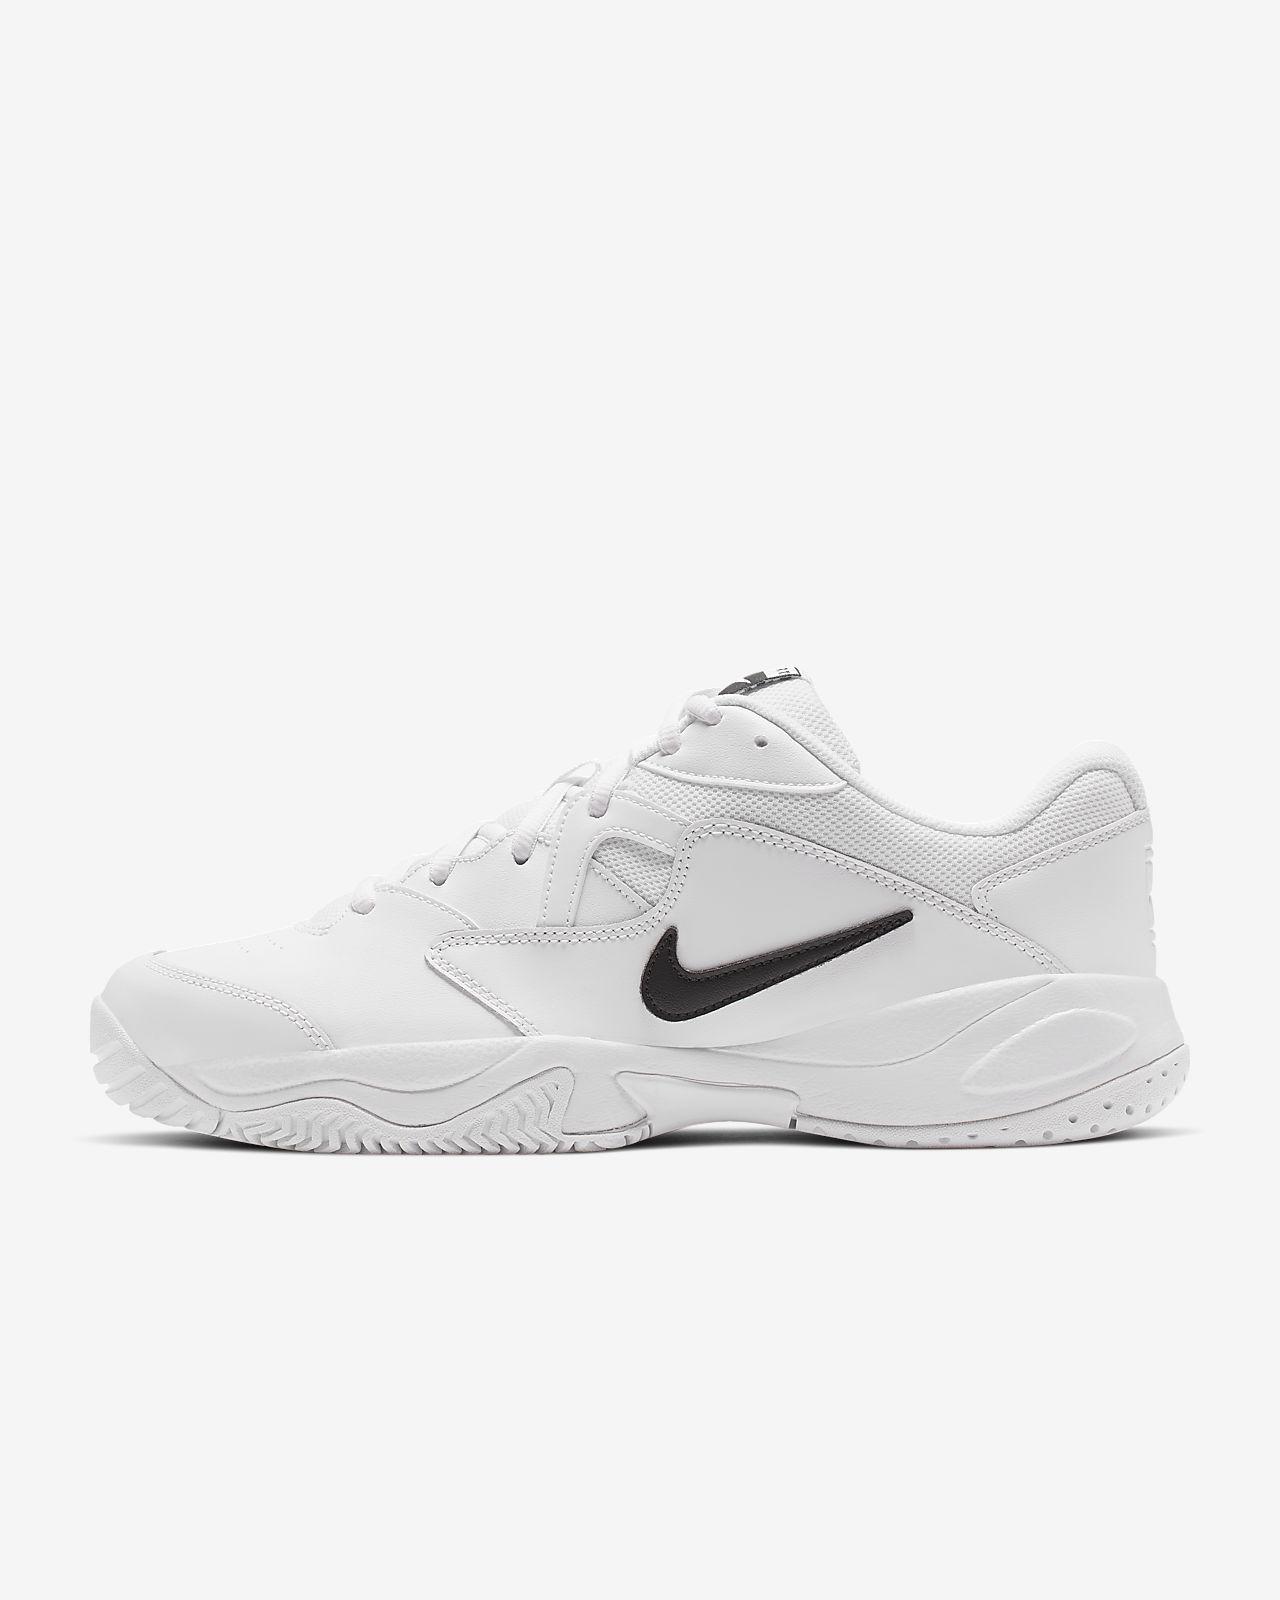 Nikecourt Lite 2 Men S Hard Court Tennis Shoe Nike Com In 2020 Tennis Shoes Mens Tennis Shoes Shoes